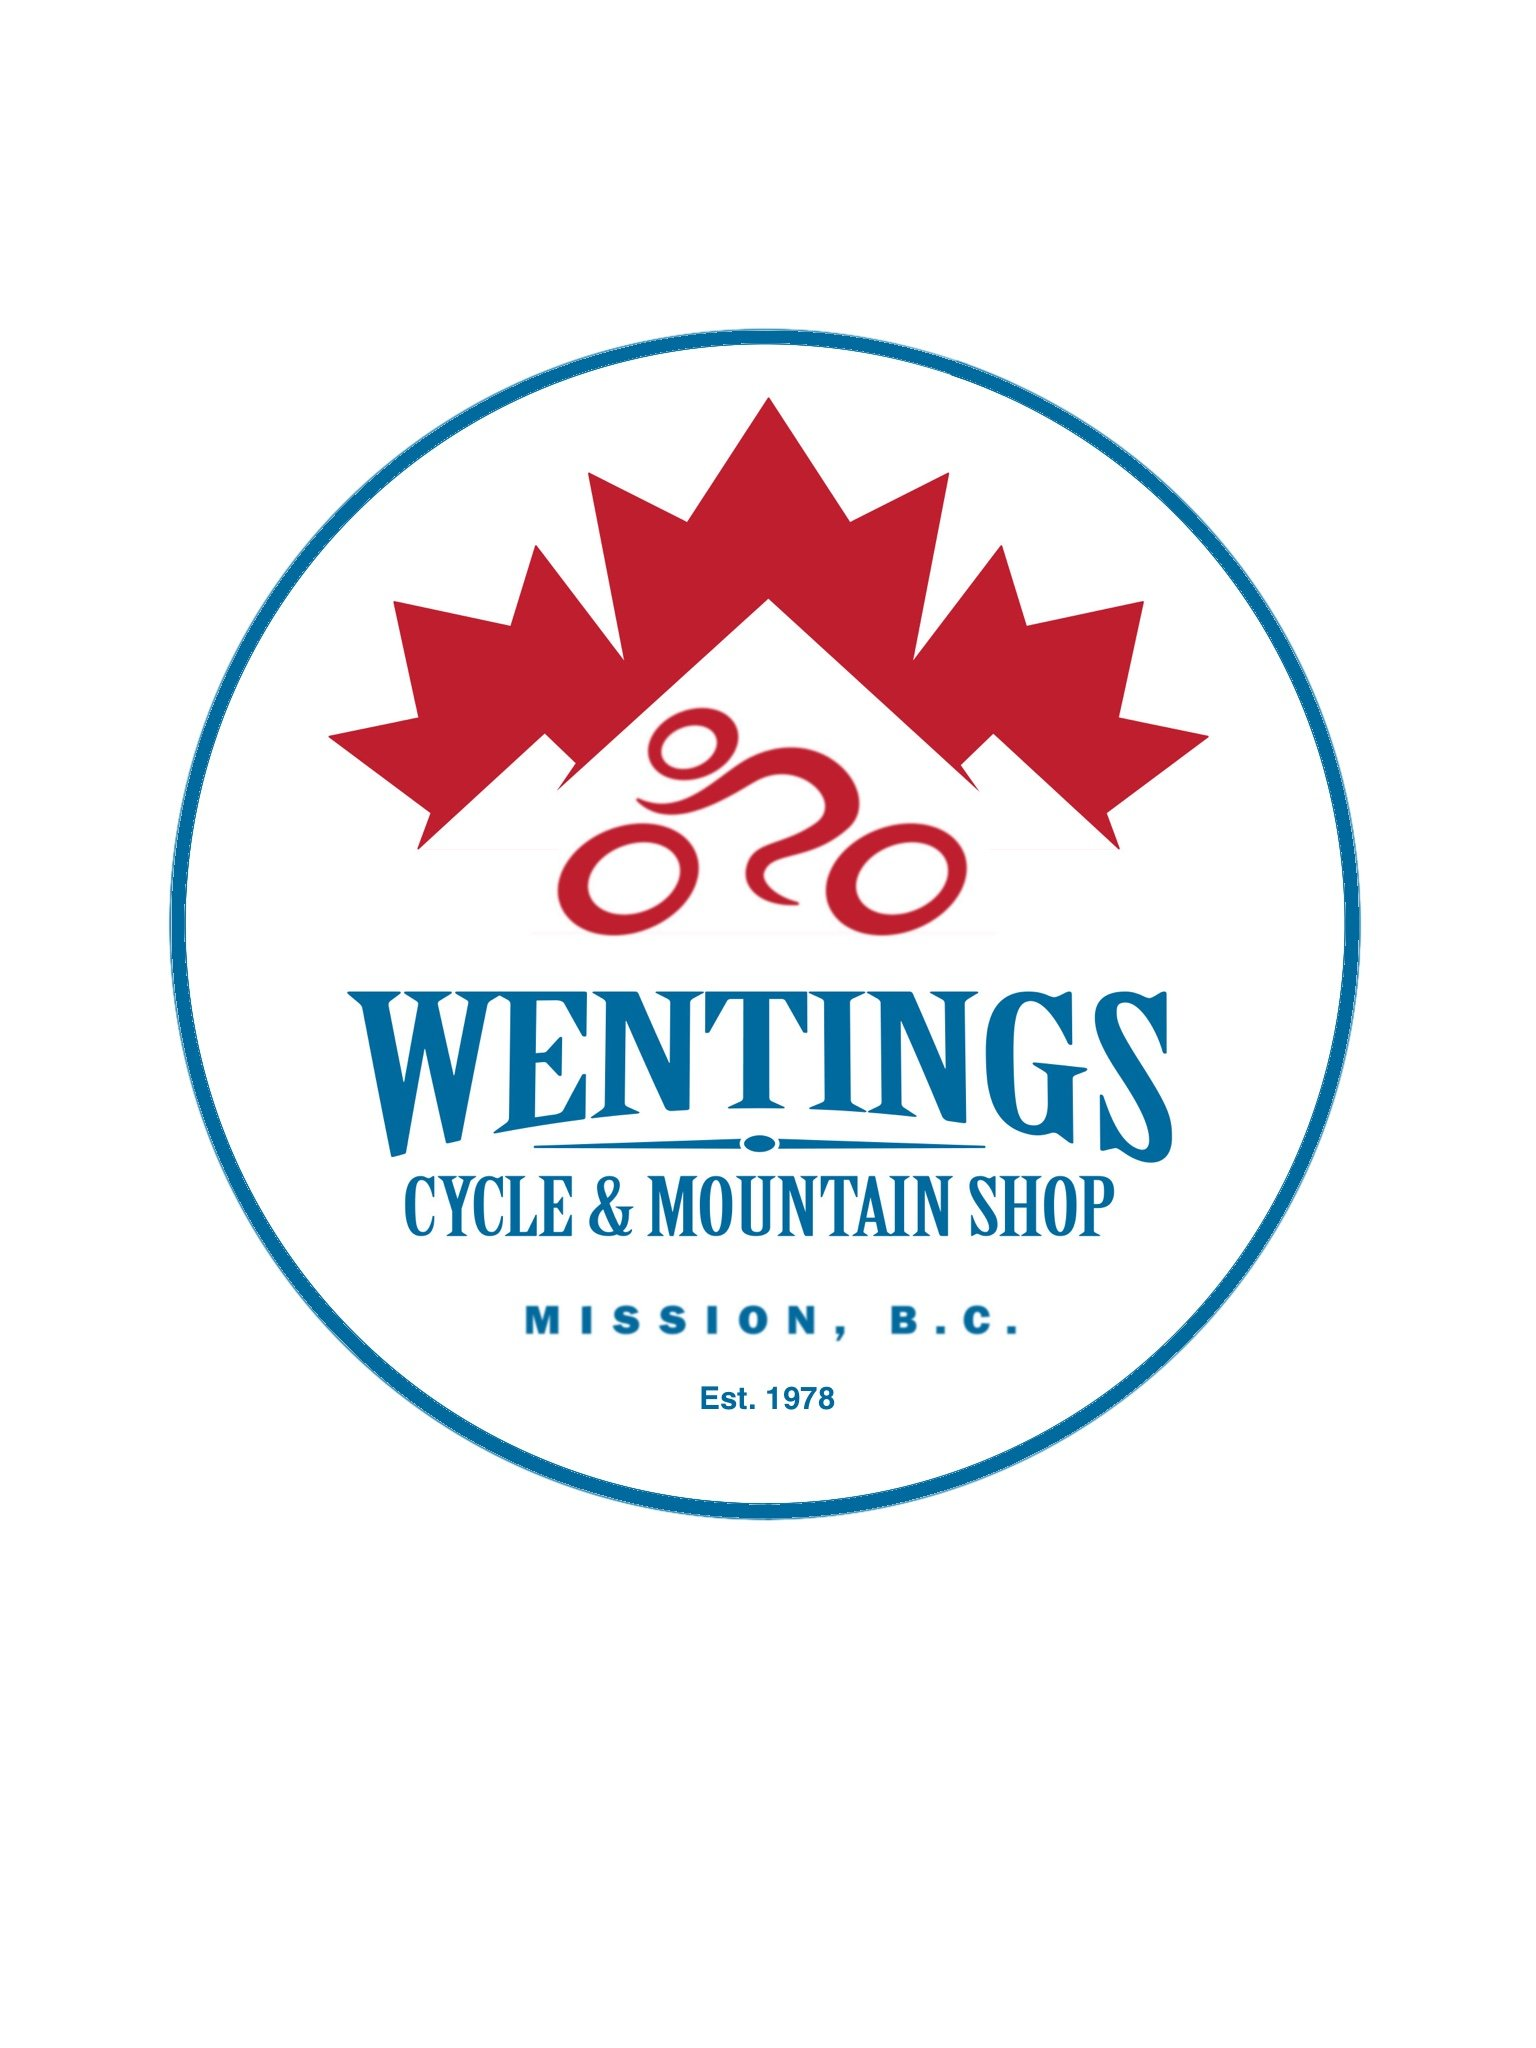 Wentings Cycle Shop